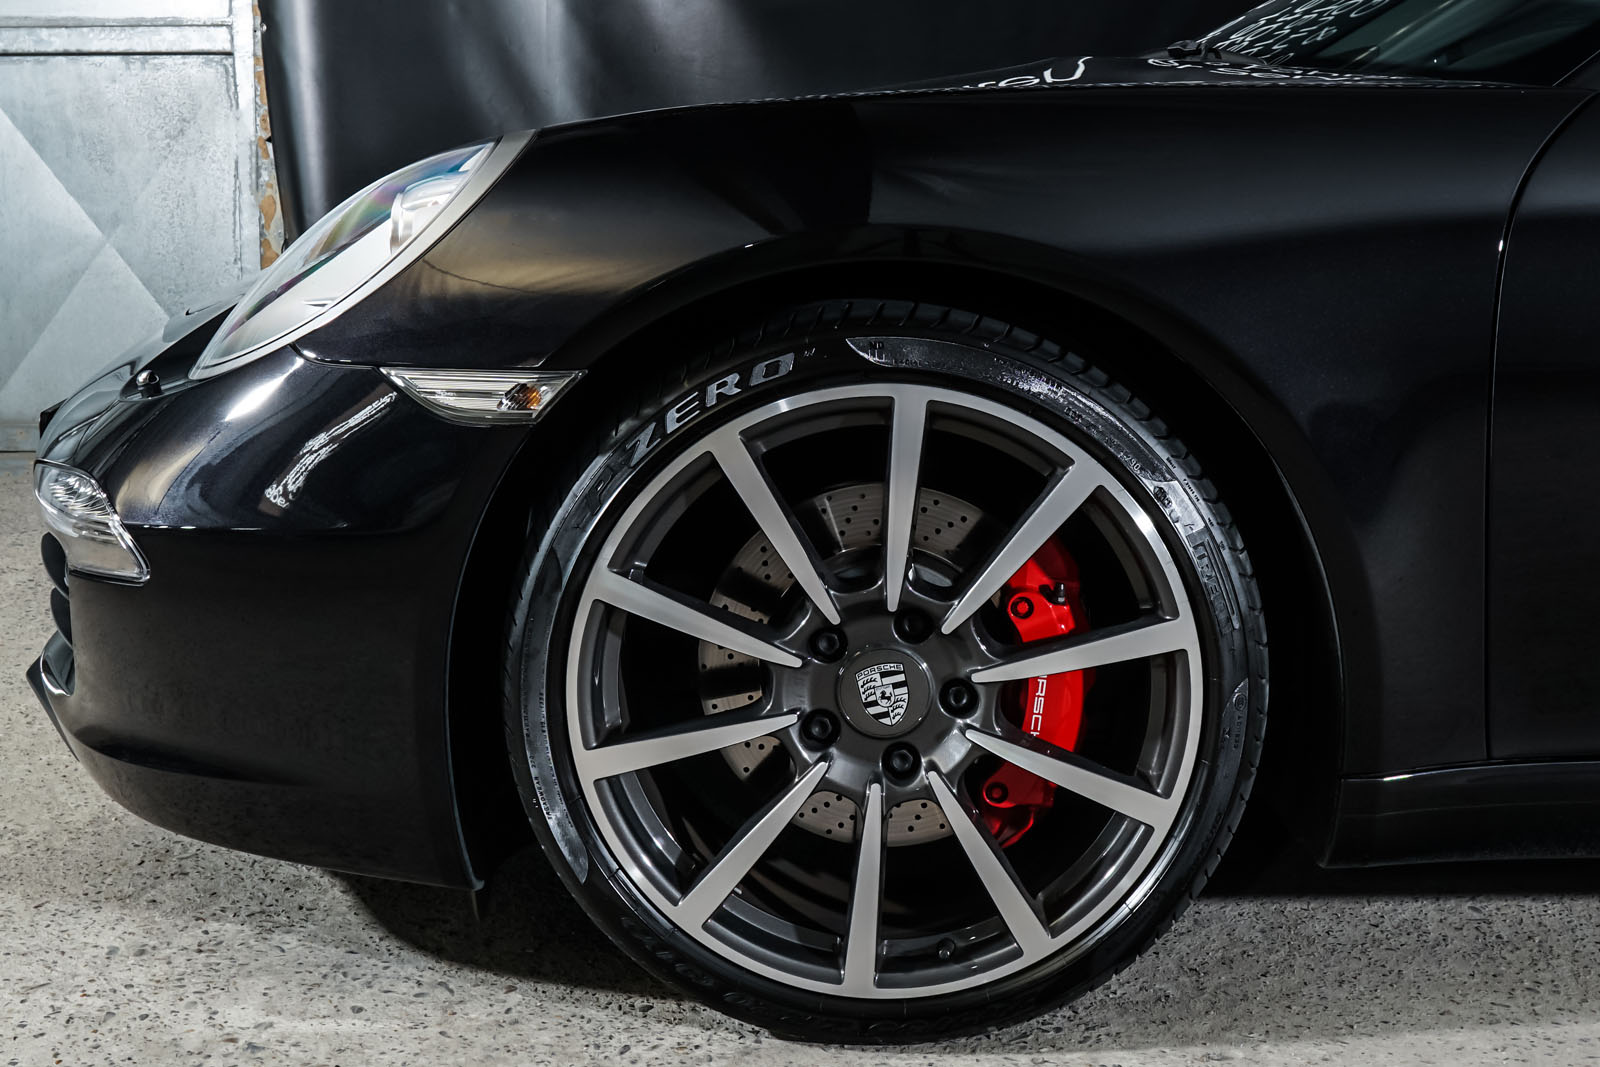 Porsche_991_CarreraS_Cabrio_Schwarz_Schwarz_POR-7555_3_w